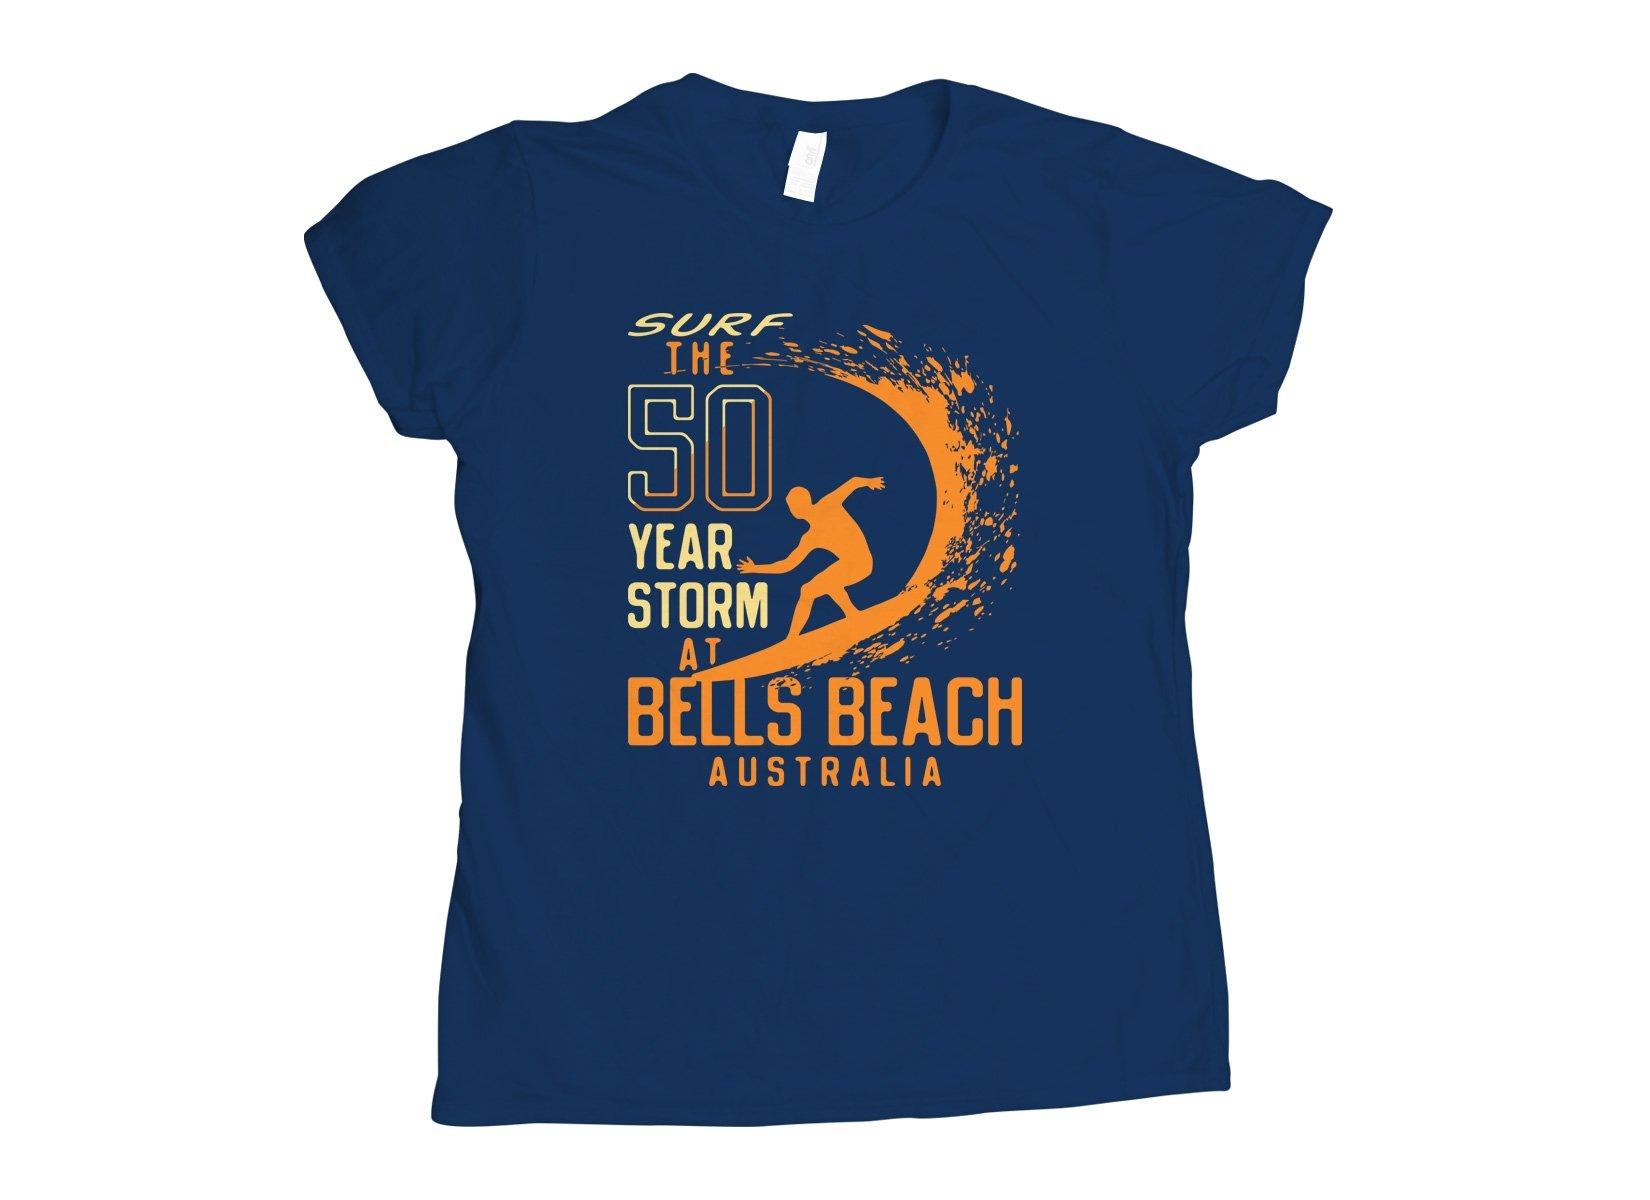 50 Year Storm At Bells Beach on Womens T-Shirt